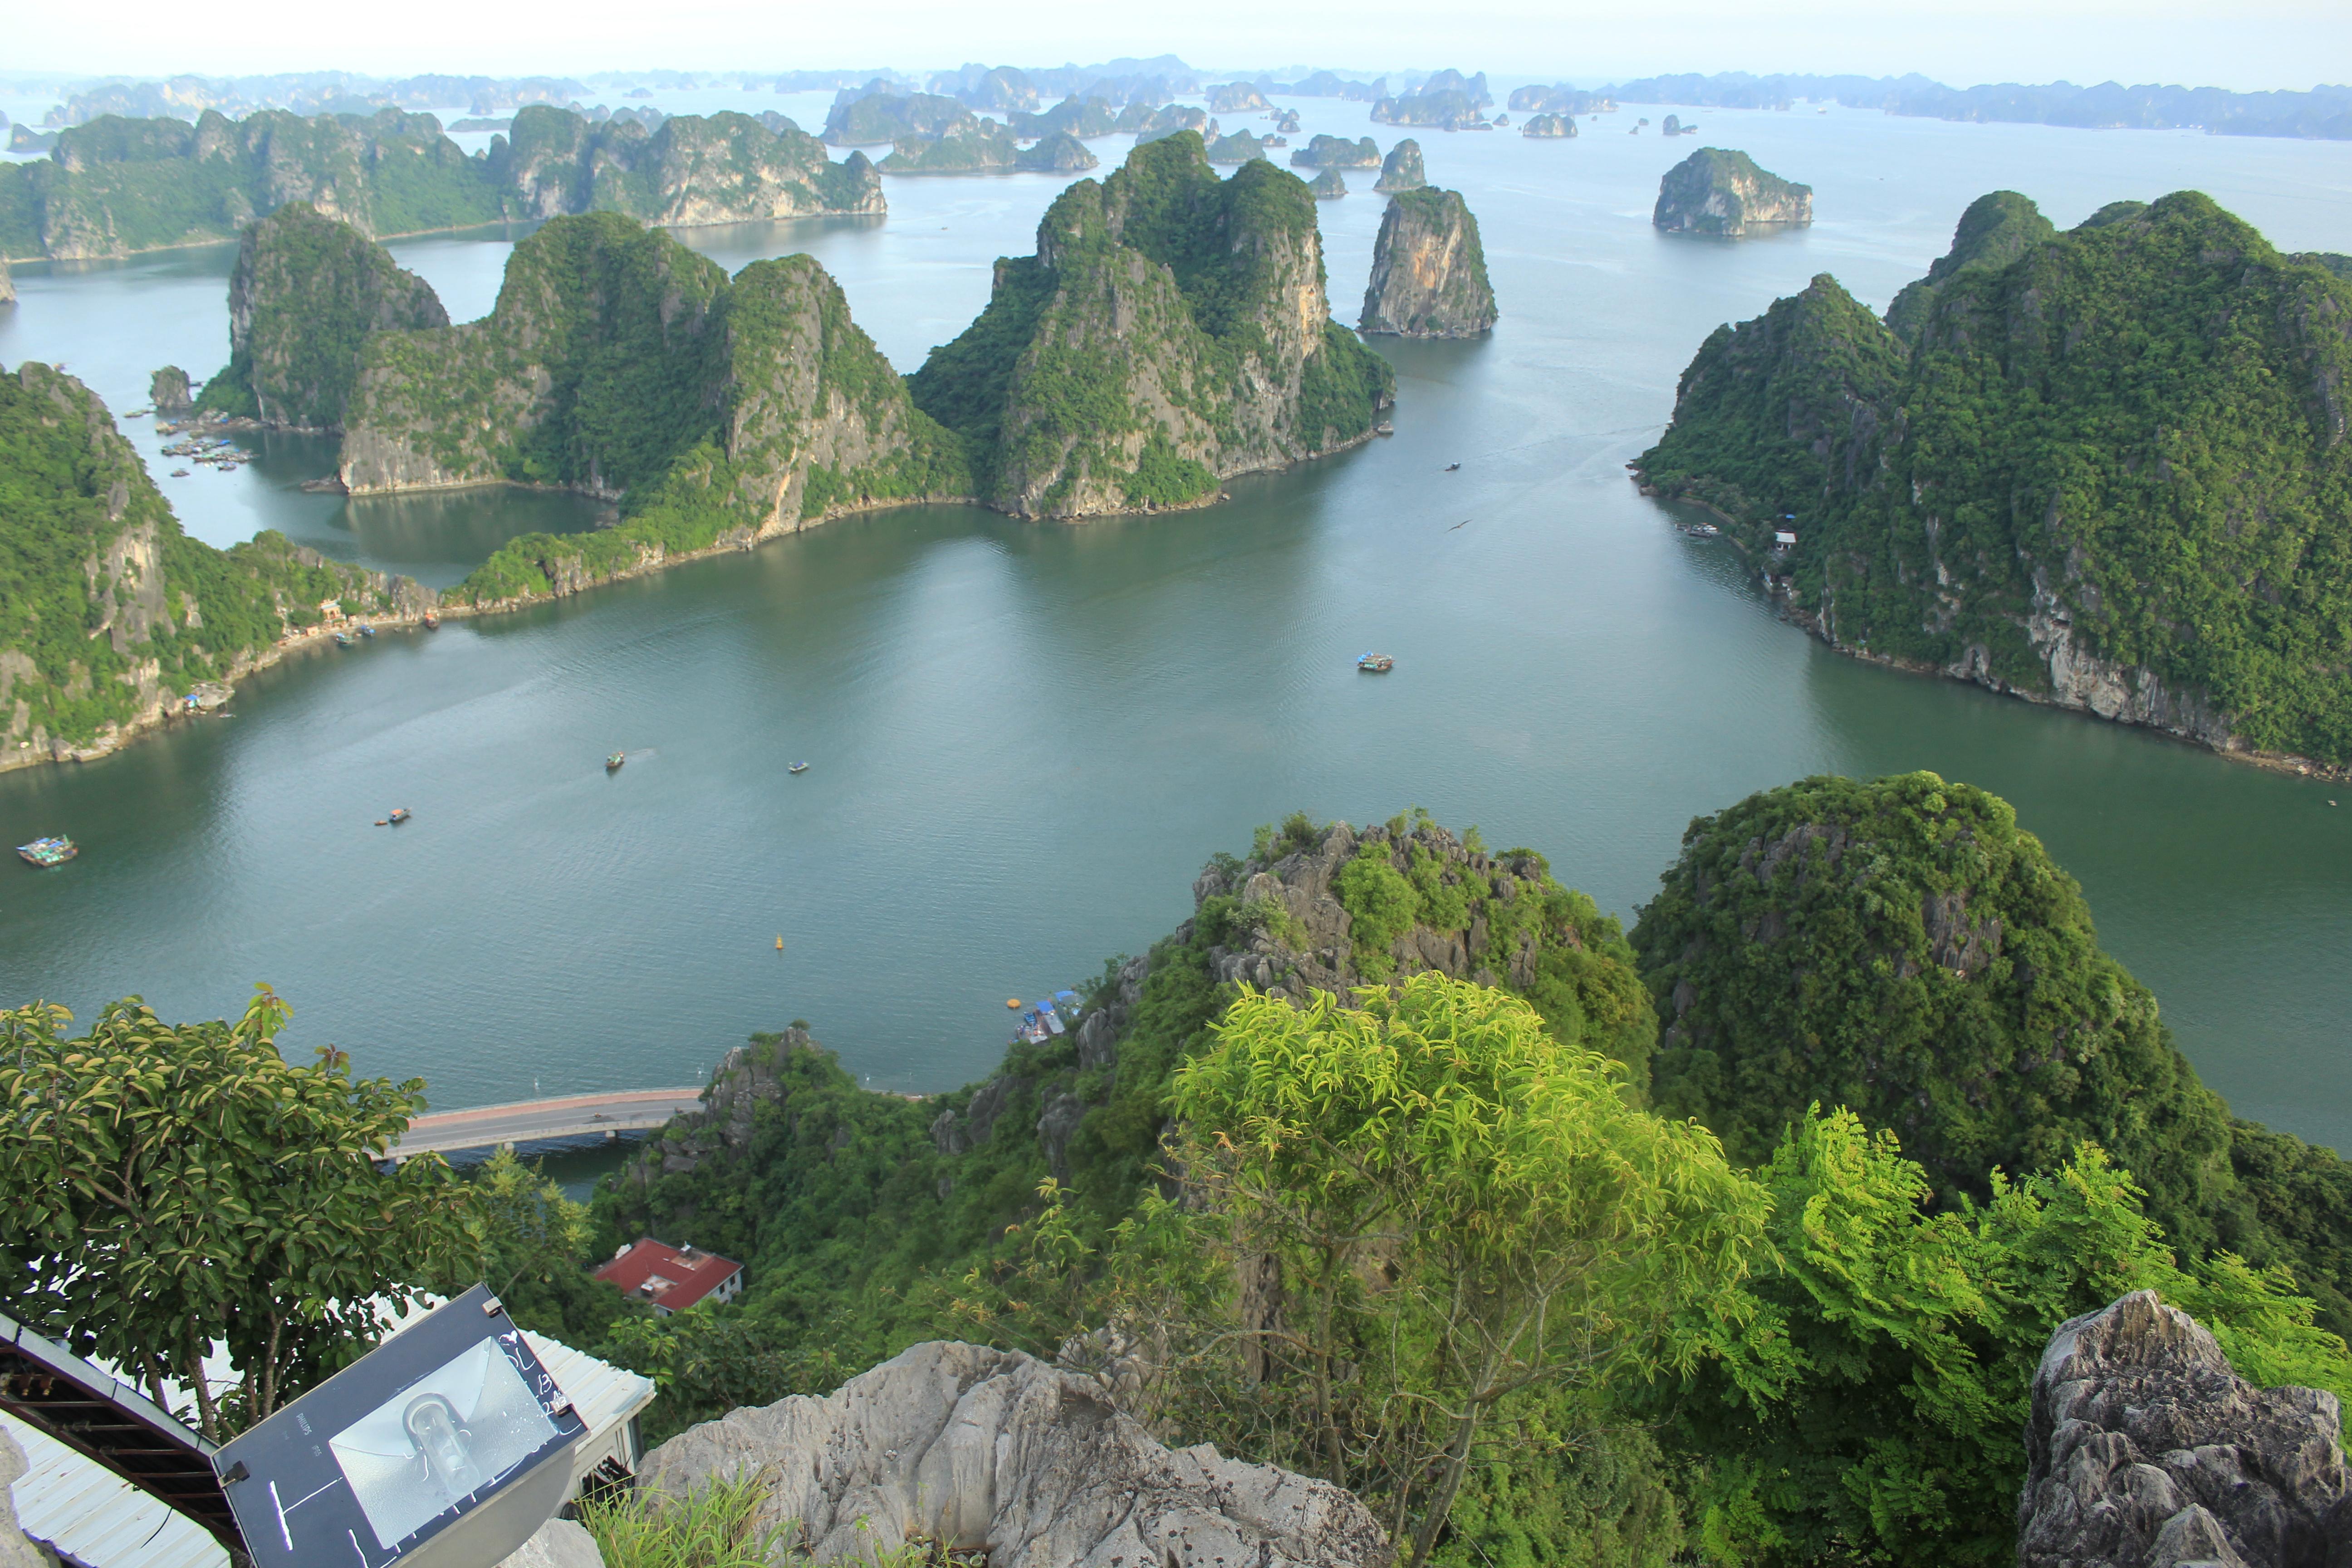 Black Iphone Wallpaper Hd Free Stock Photo Of Halong Bay Vietnam